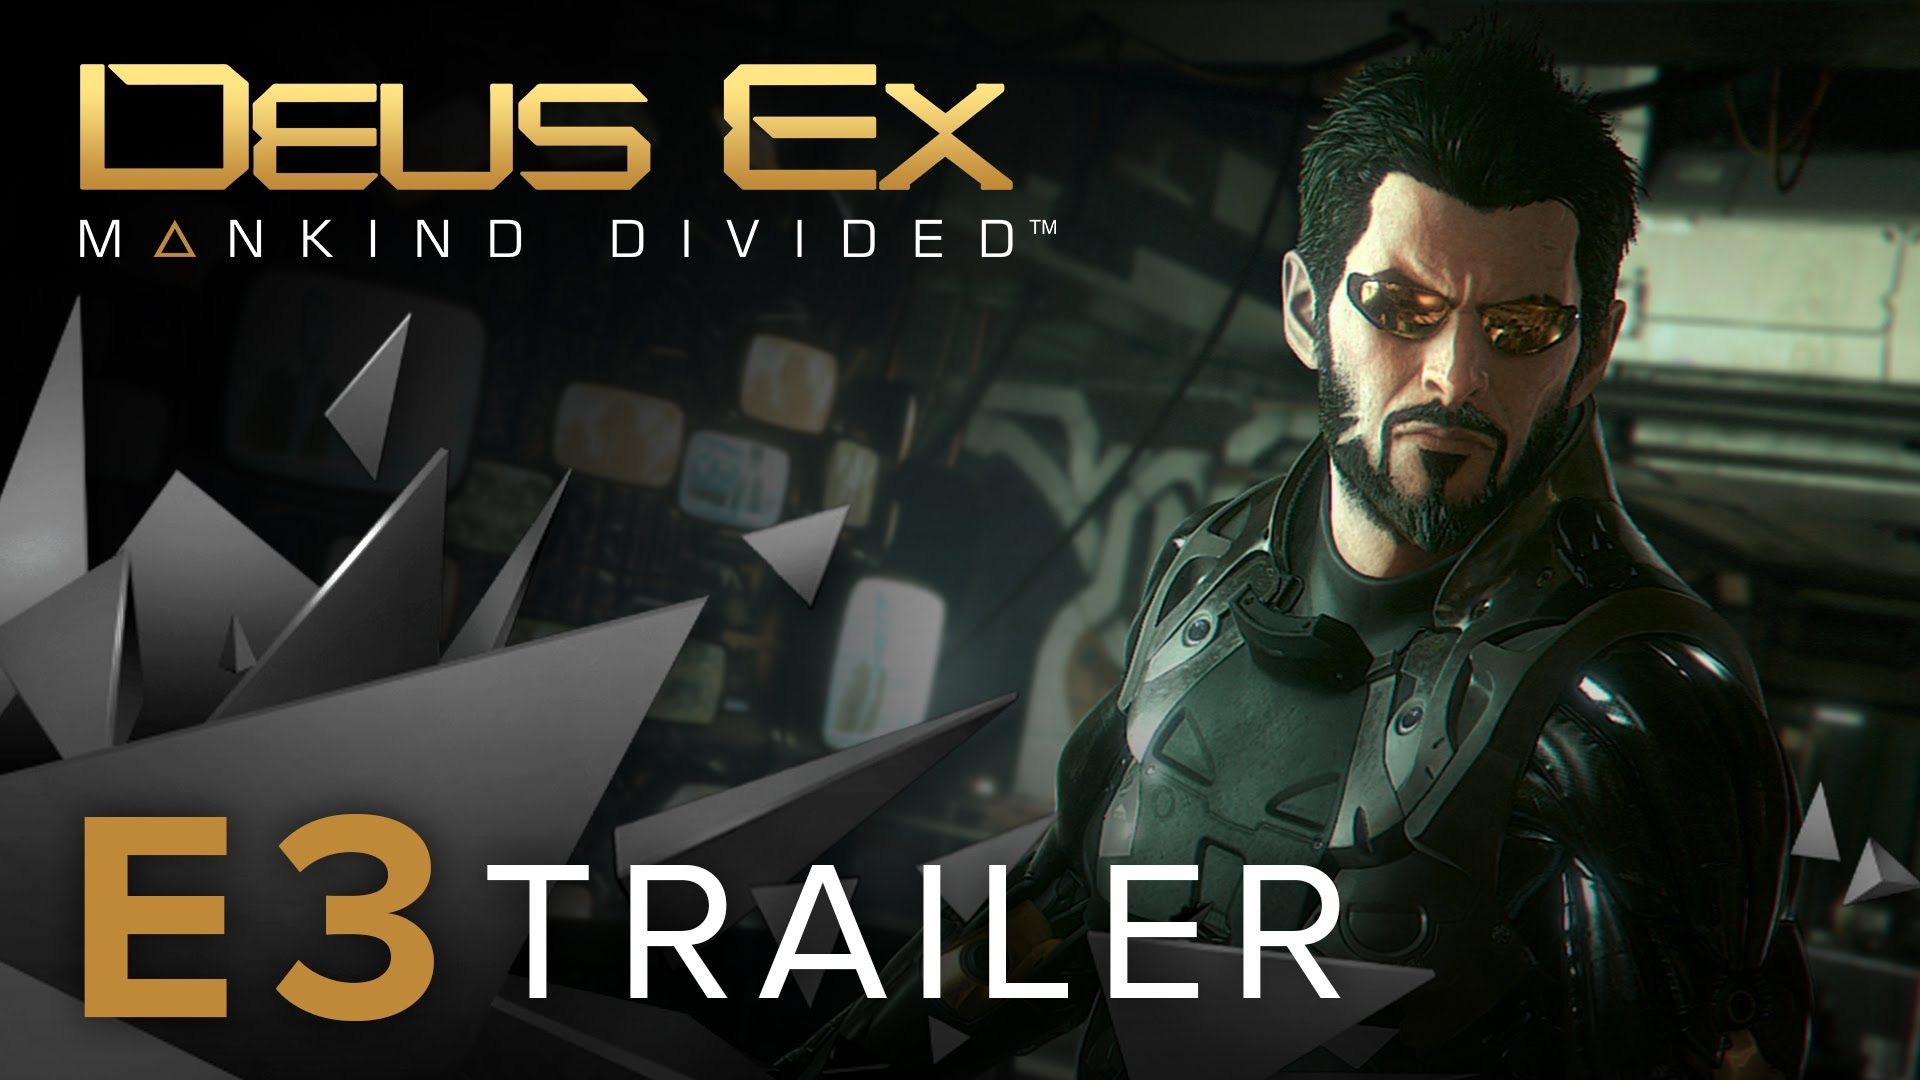 Square Enix Already Showcase Gameplay Of Deus Ex Mankind Divided